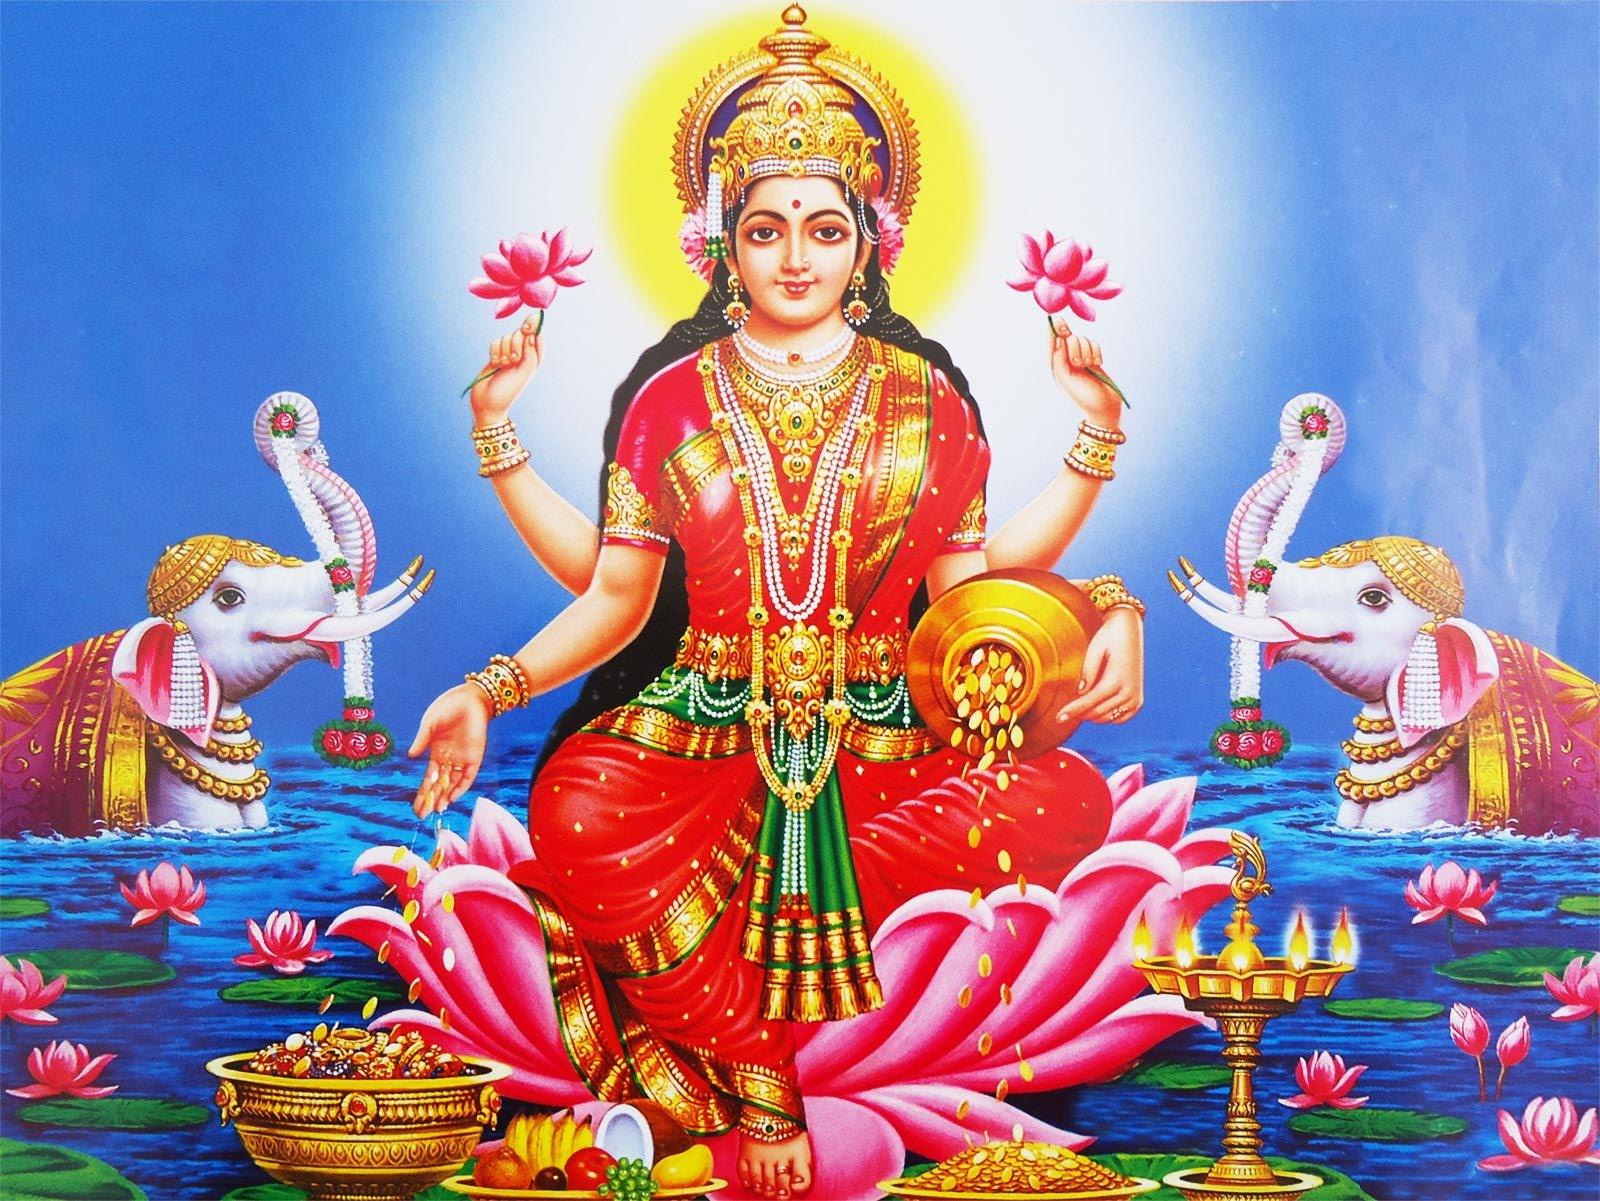 श्री महालक्ष्मी गायत्री मंत्र  Sri MahaLakshmi Gayatri Mantra Spiritual Wealth and Luxuries